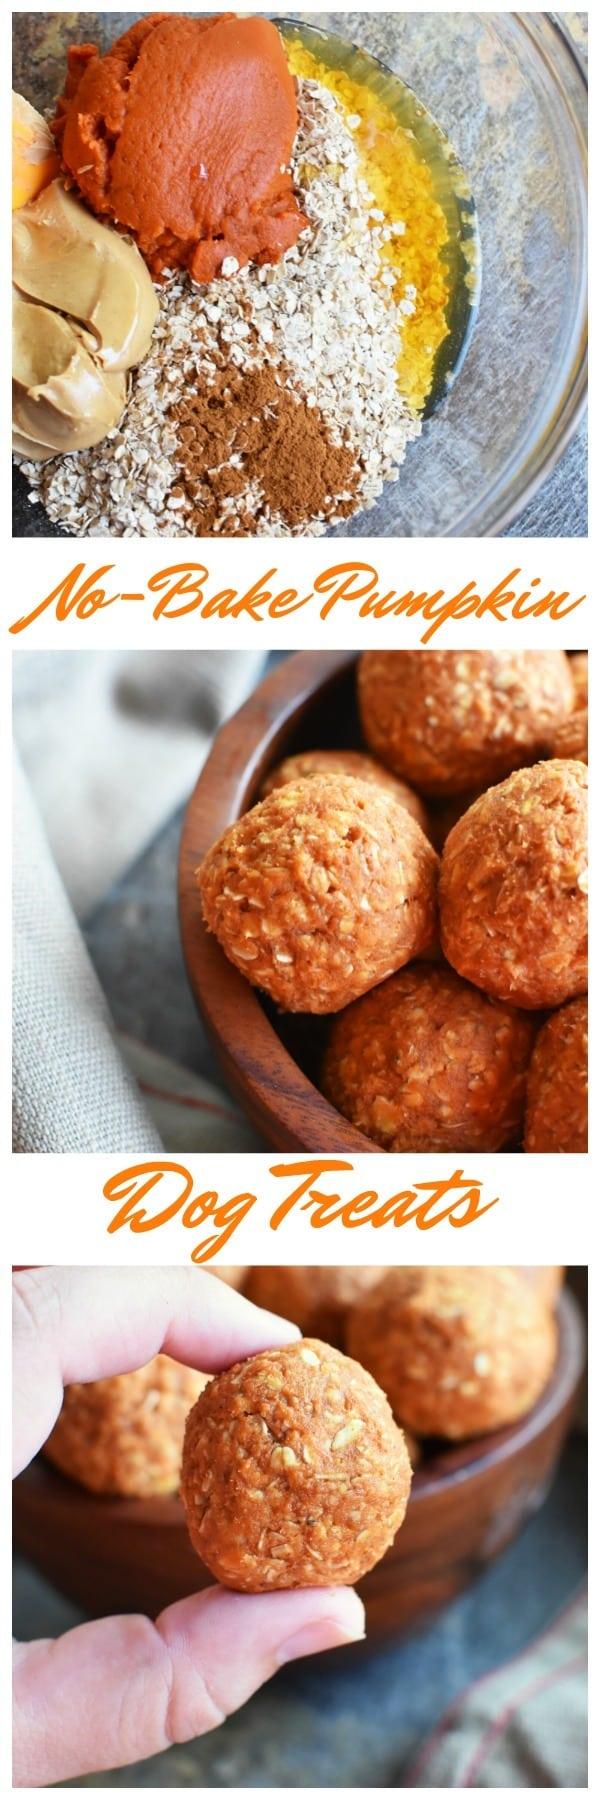 No-Bake Pumpkin Dog Treats